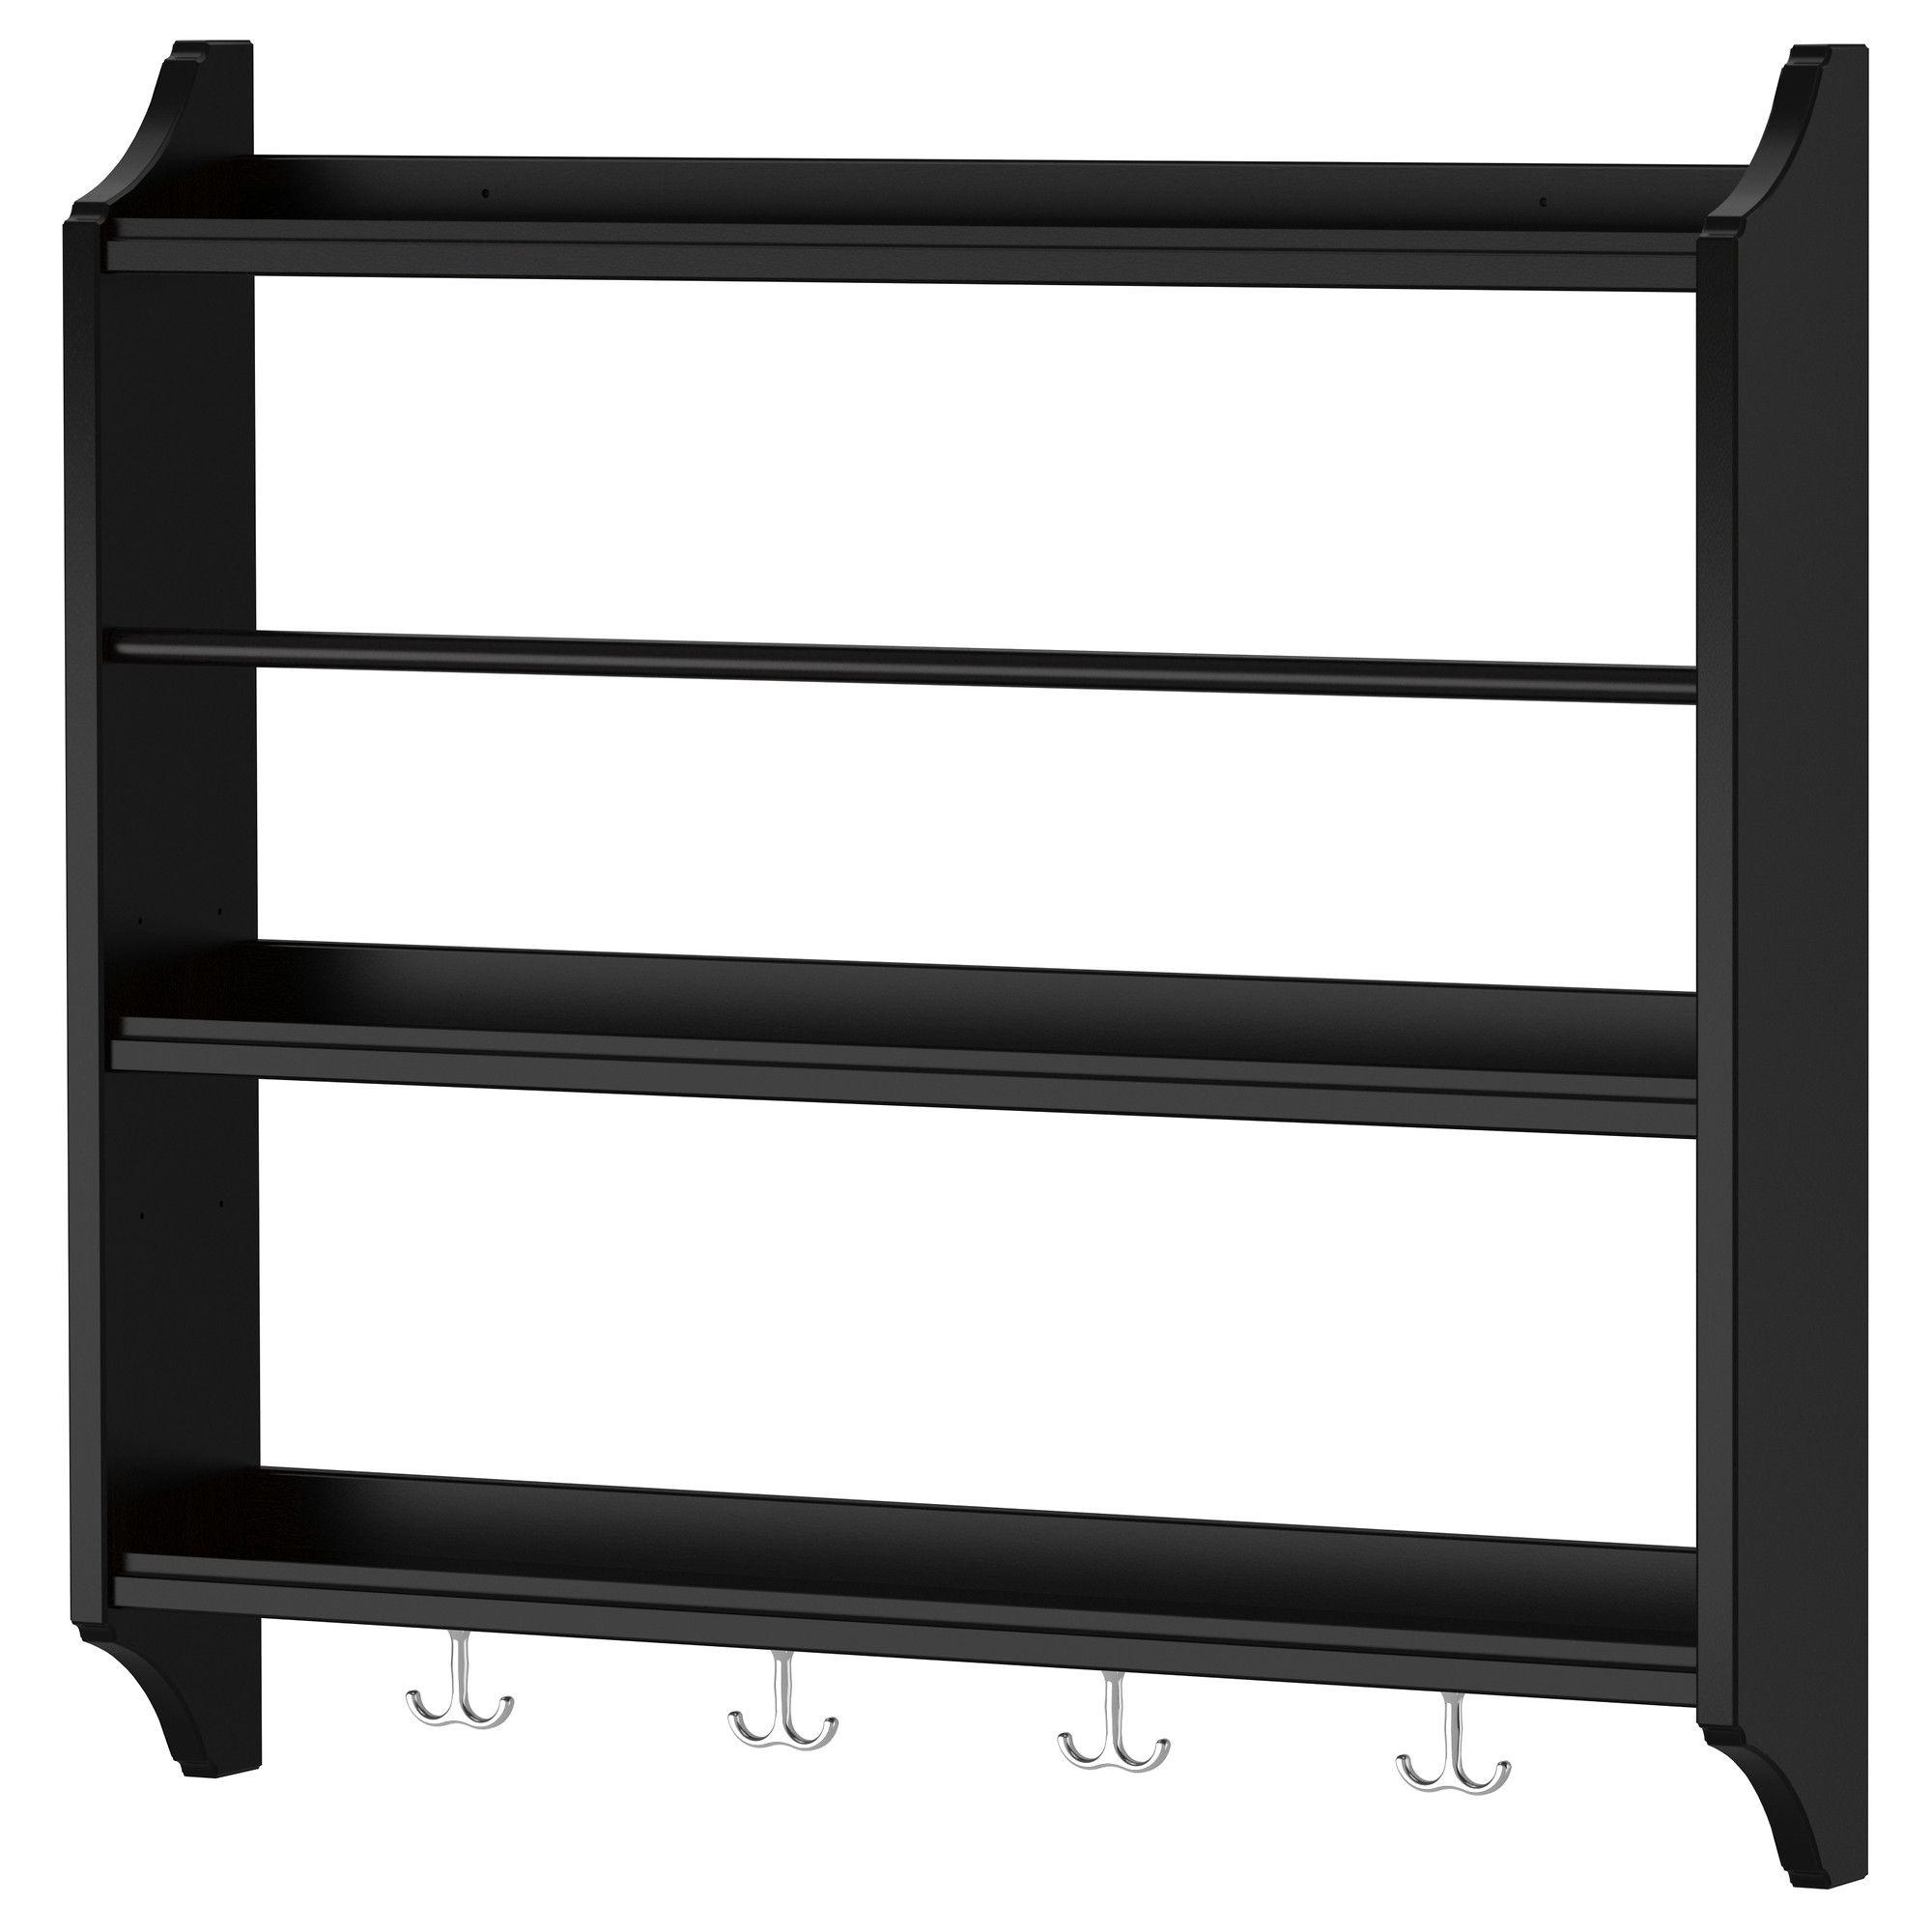 Küchensachen Ikea ~ stenstorp tellerregal ikea ideas for the home pinterest